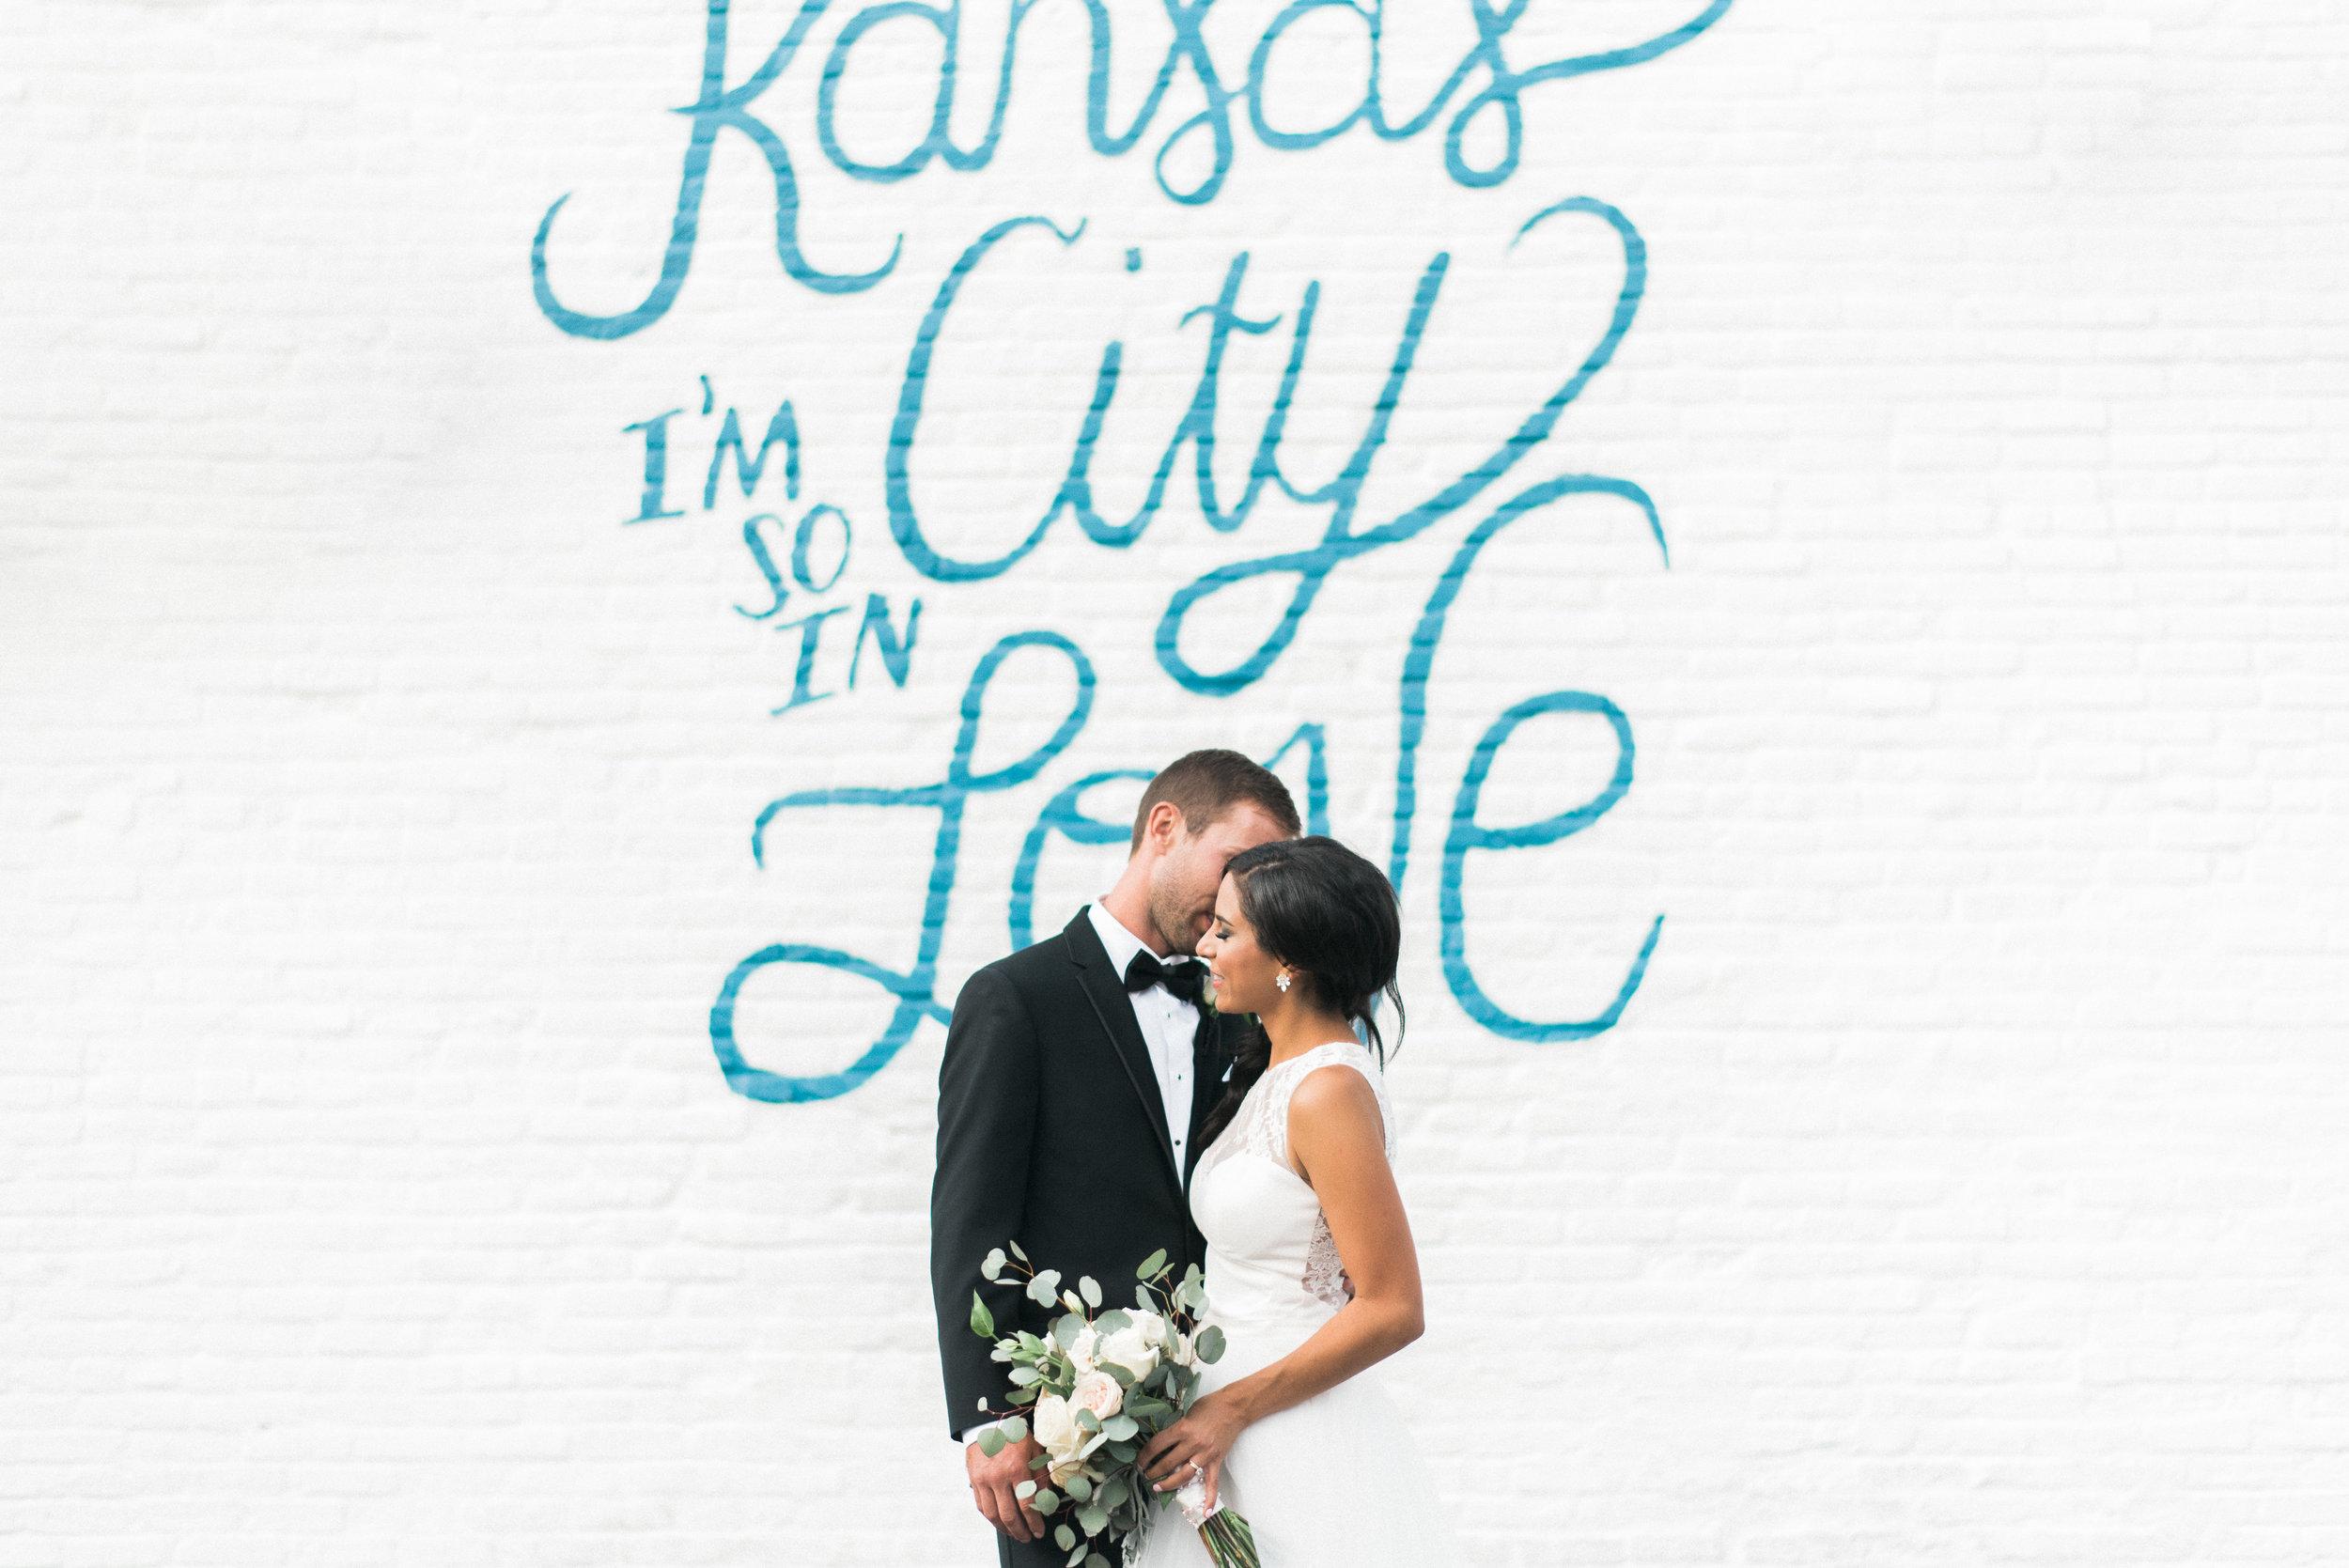 Derek Fisher & Sarah Gayed's wedding photographs by Kansas City wedding and portrait photographer Rusty Wright.